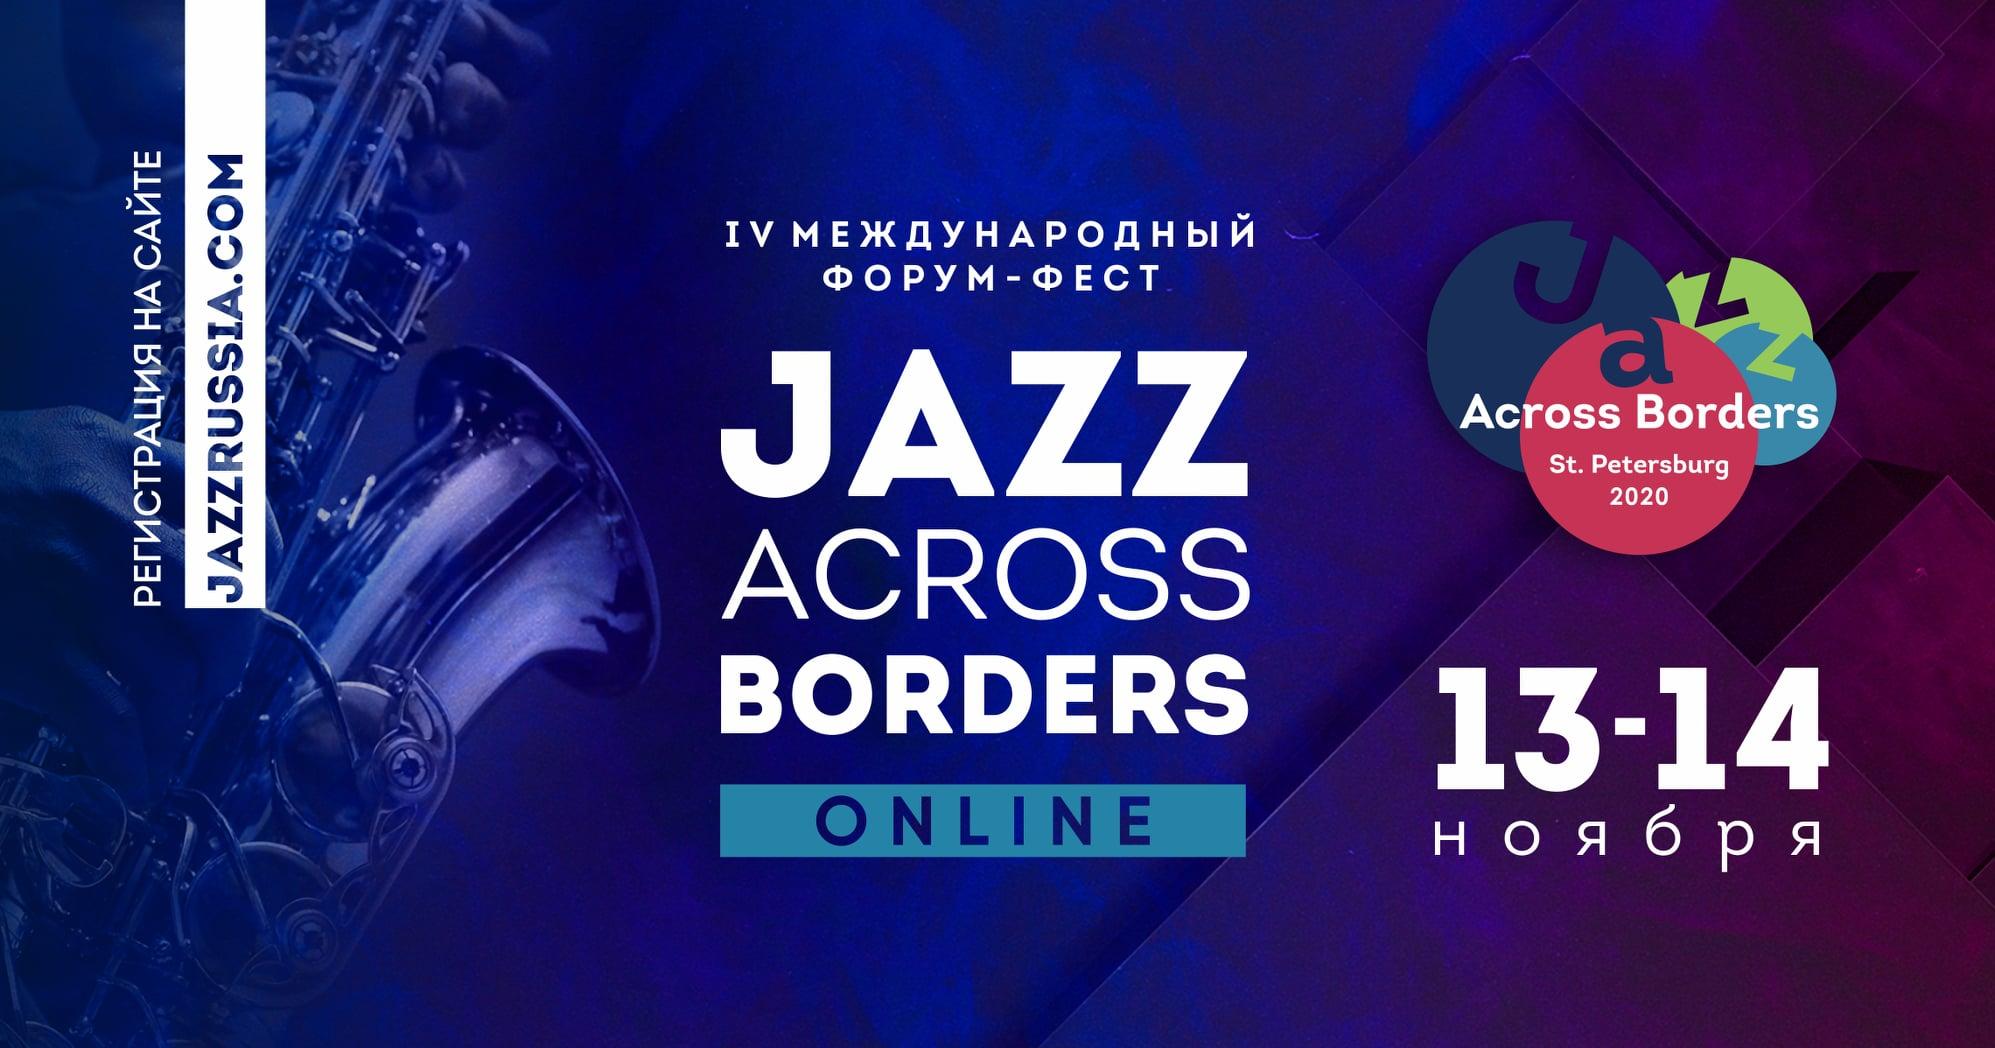 Форум-фест Jazz Across Borders пройдет онлайн при поддержке РМС